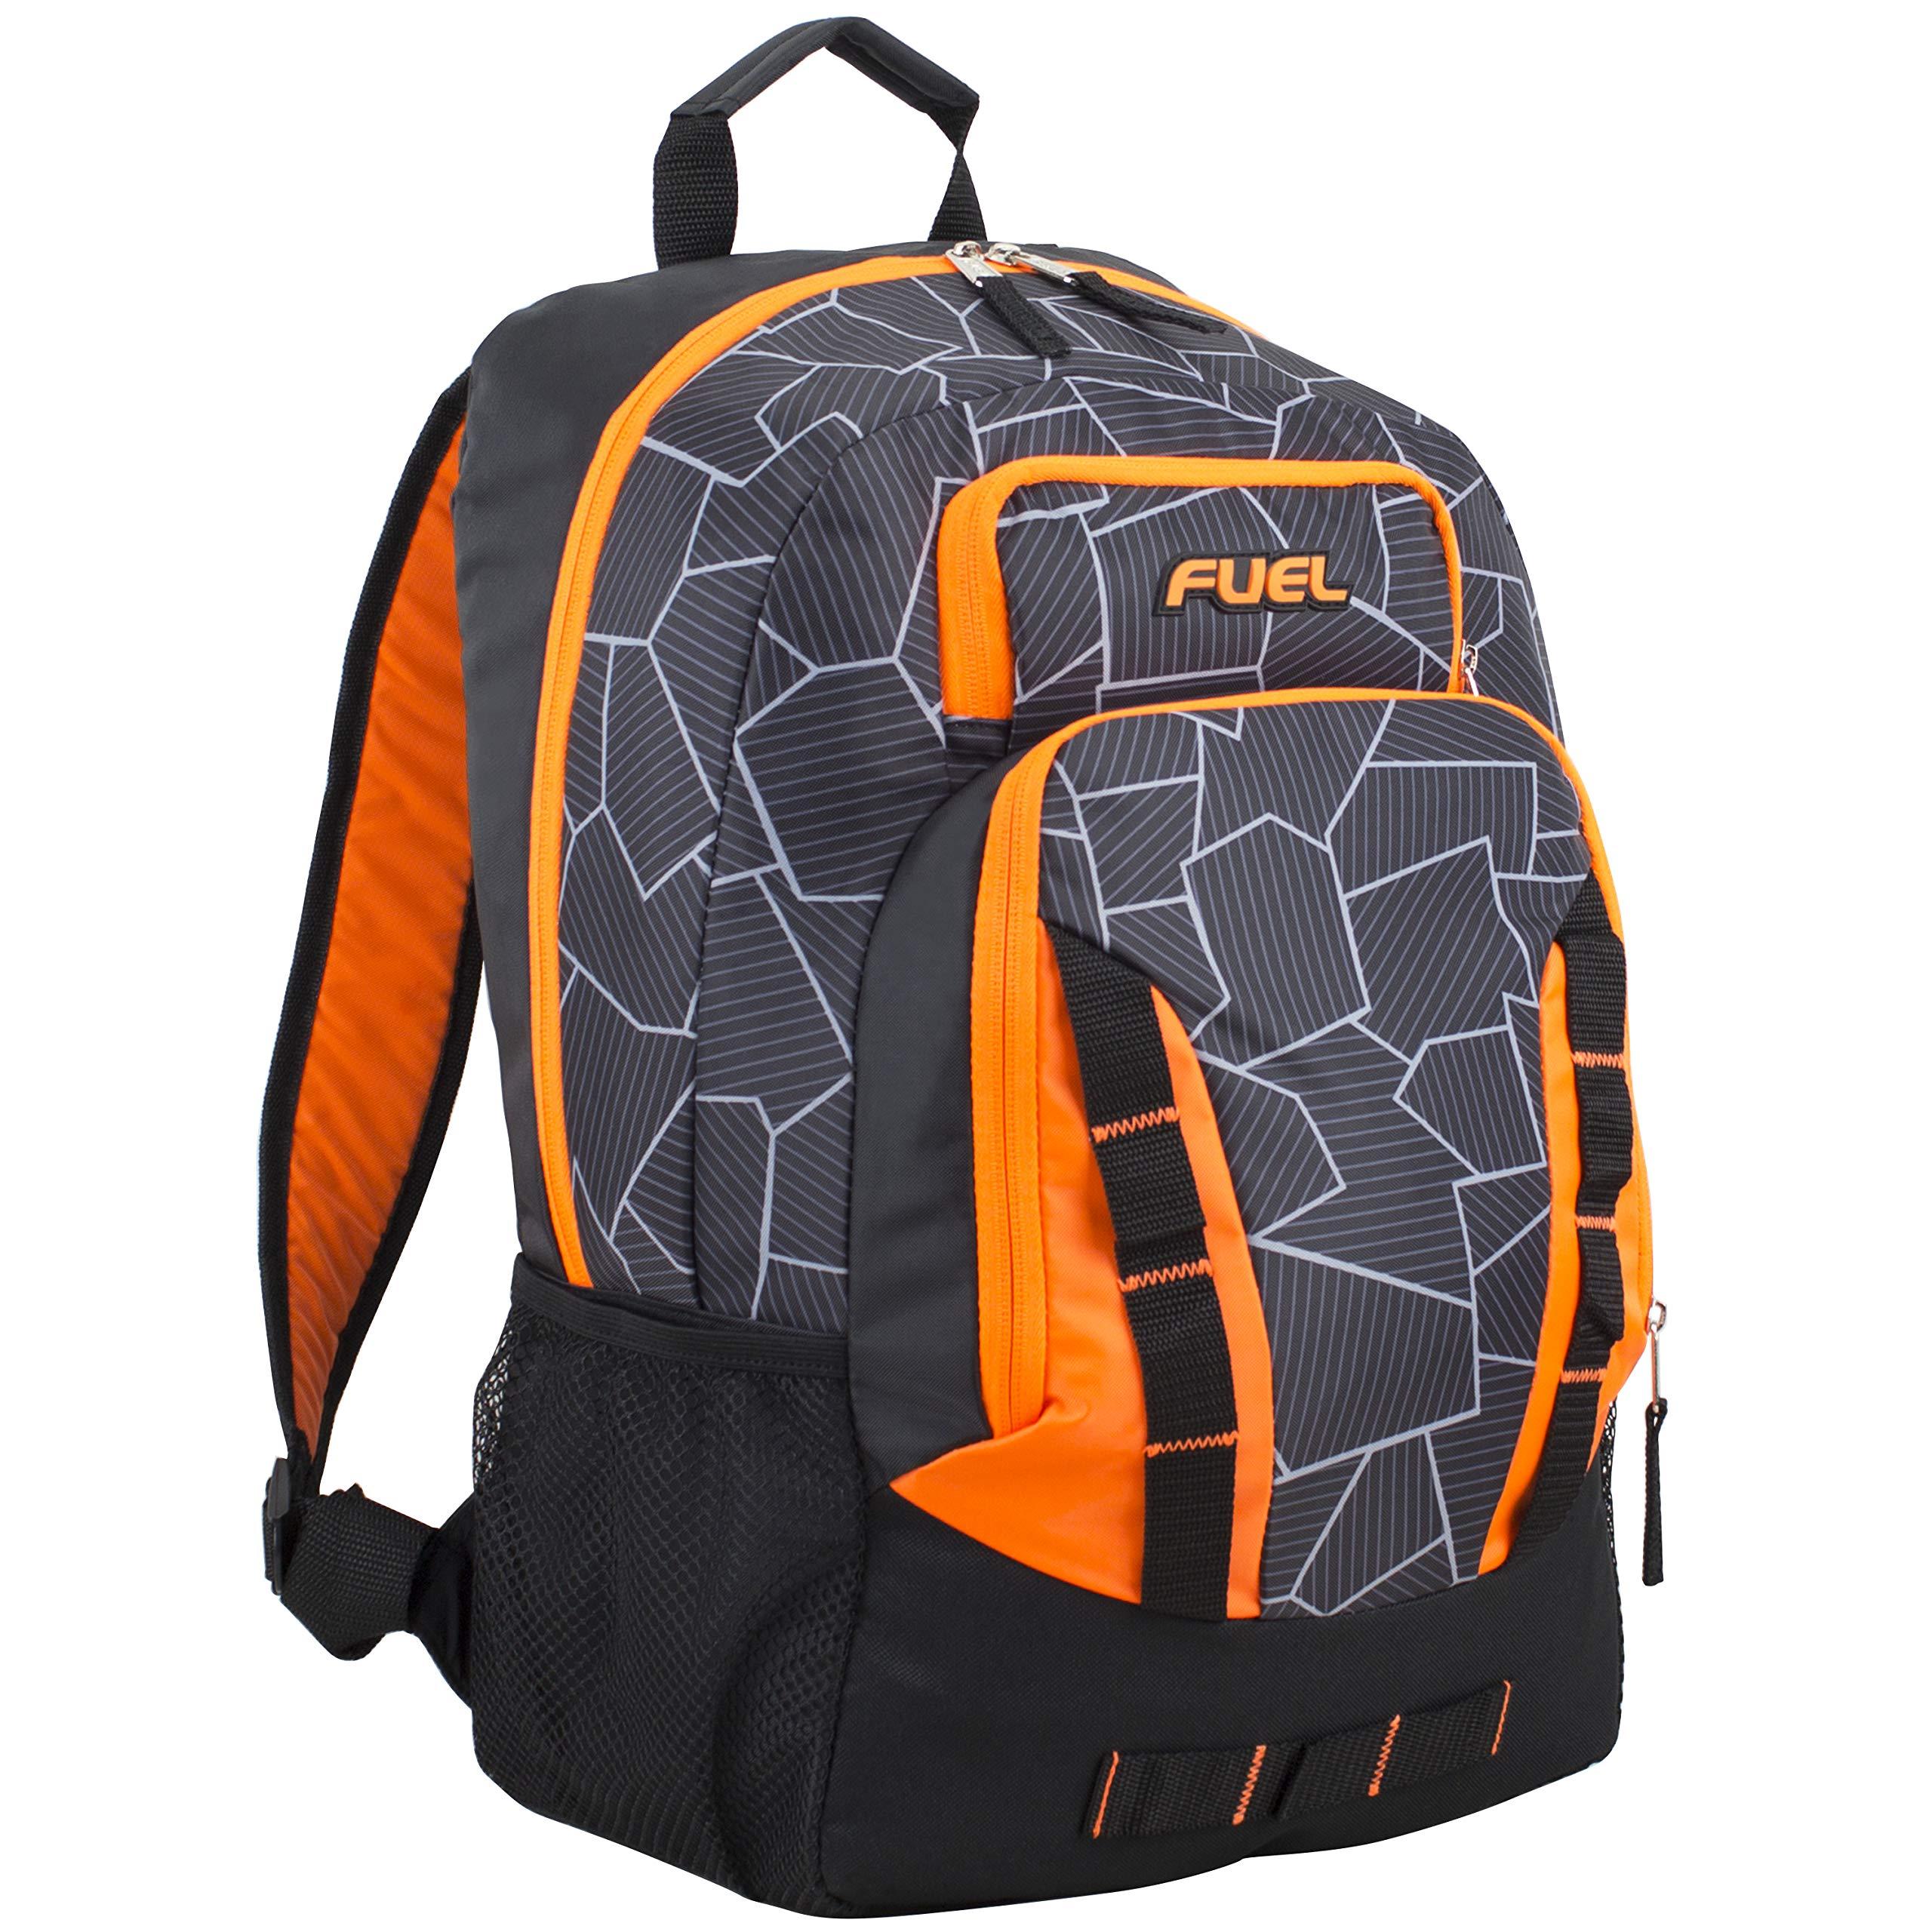 Fuel Escape Travel Backpack, School Bookbag, Durable Camping or Hiking Backpack, Black/Orange/Gray Geometric Cracks Print by Fuel